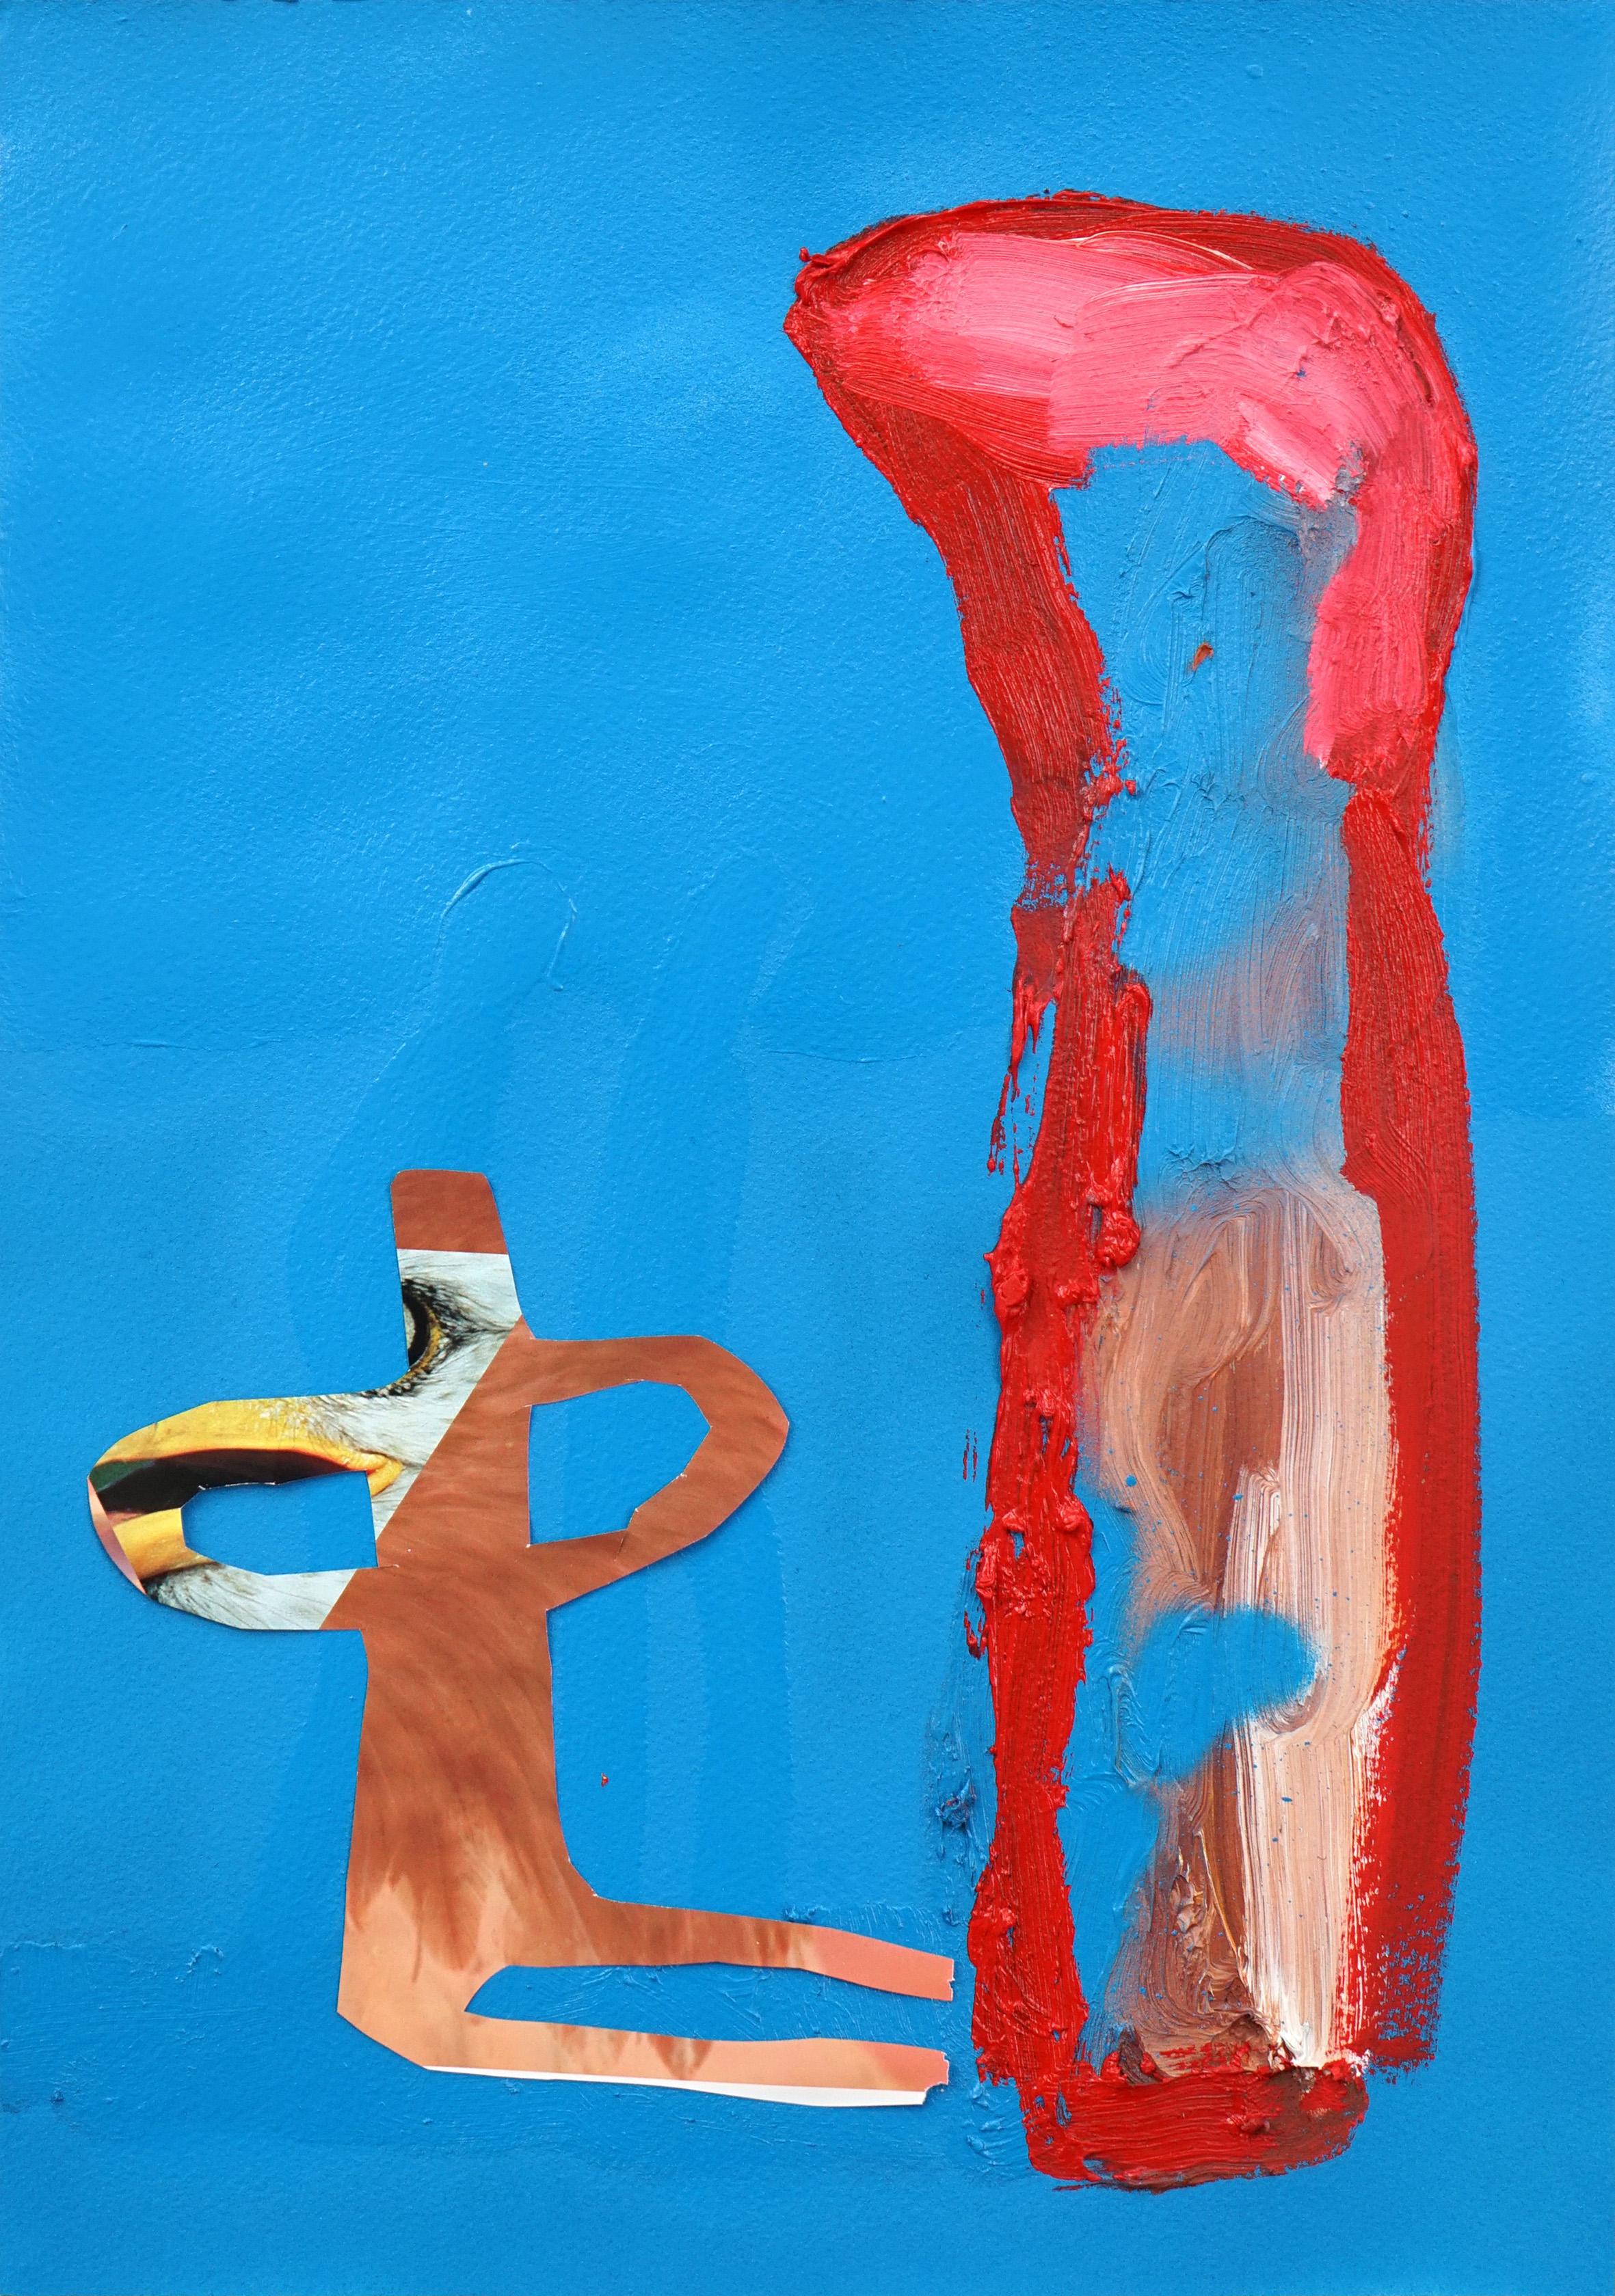 Untitled  2016  Oil, aerosol, magazine cut out and PVA glue on paper  29.7 x 42 cm